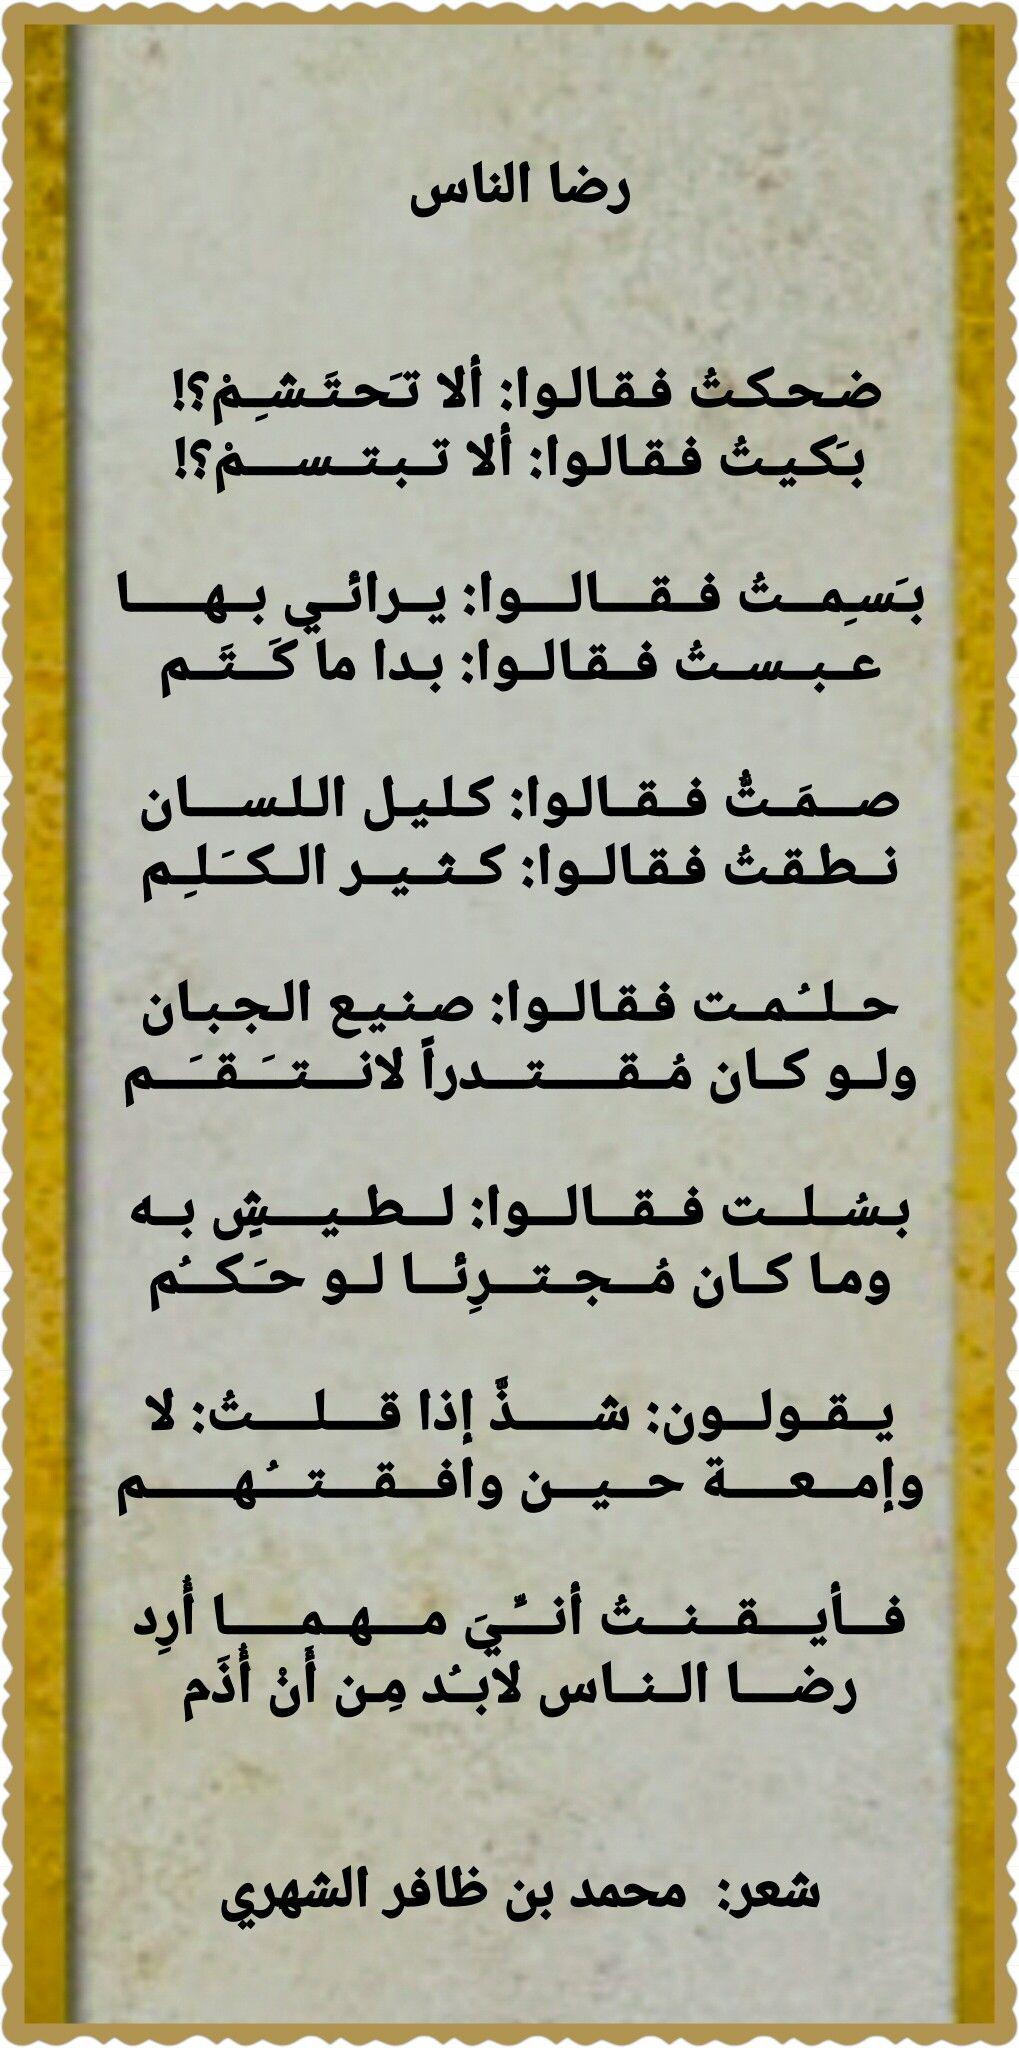 رضا الناس غاية لا تدرك Quotations Beautiful Arabic Words Arabic Quotes